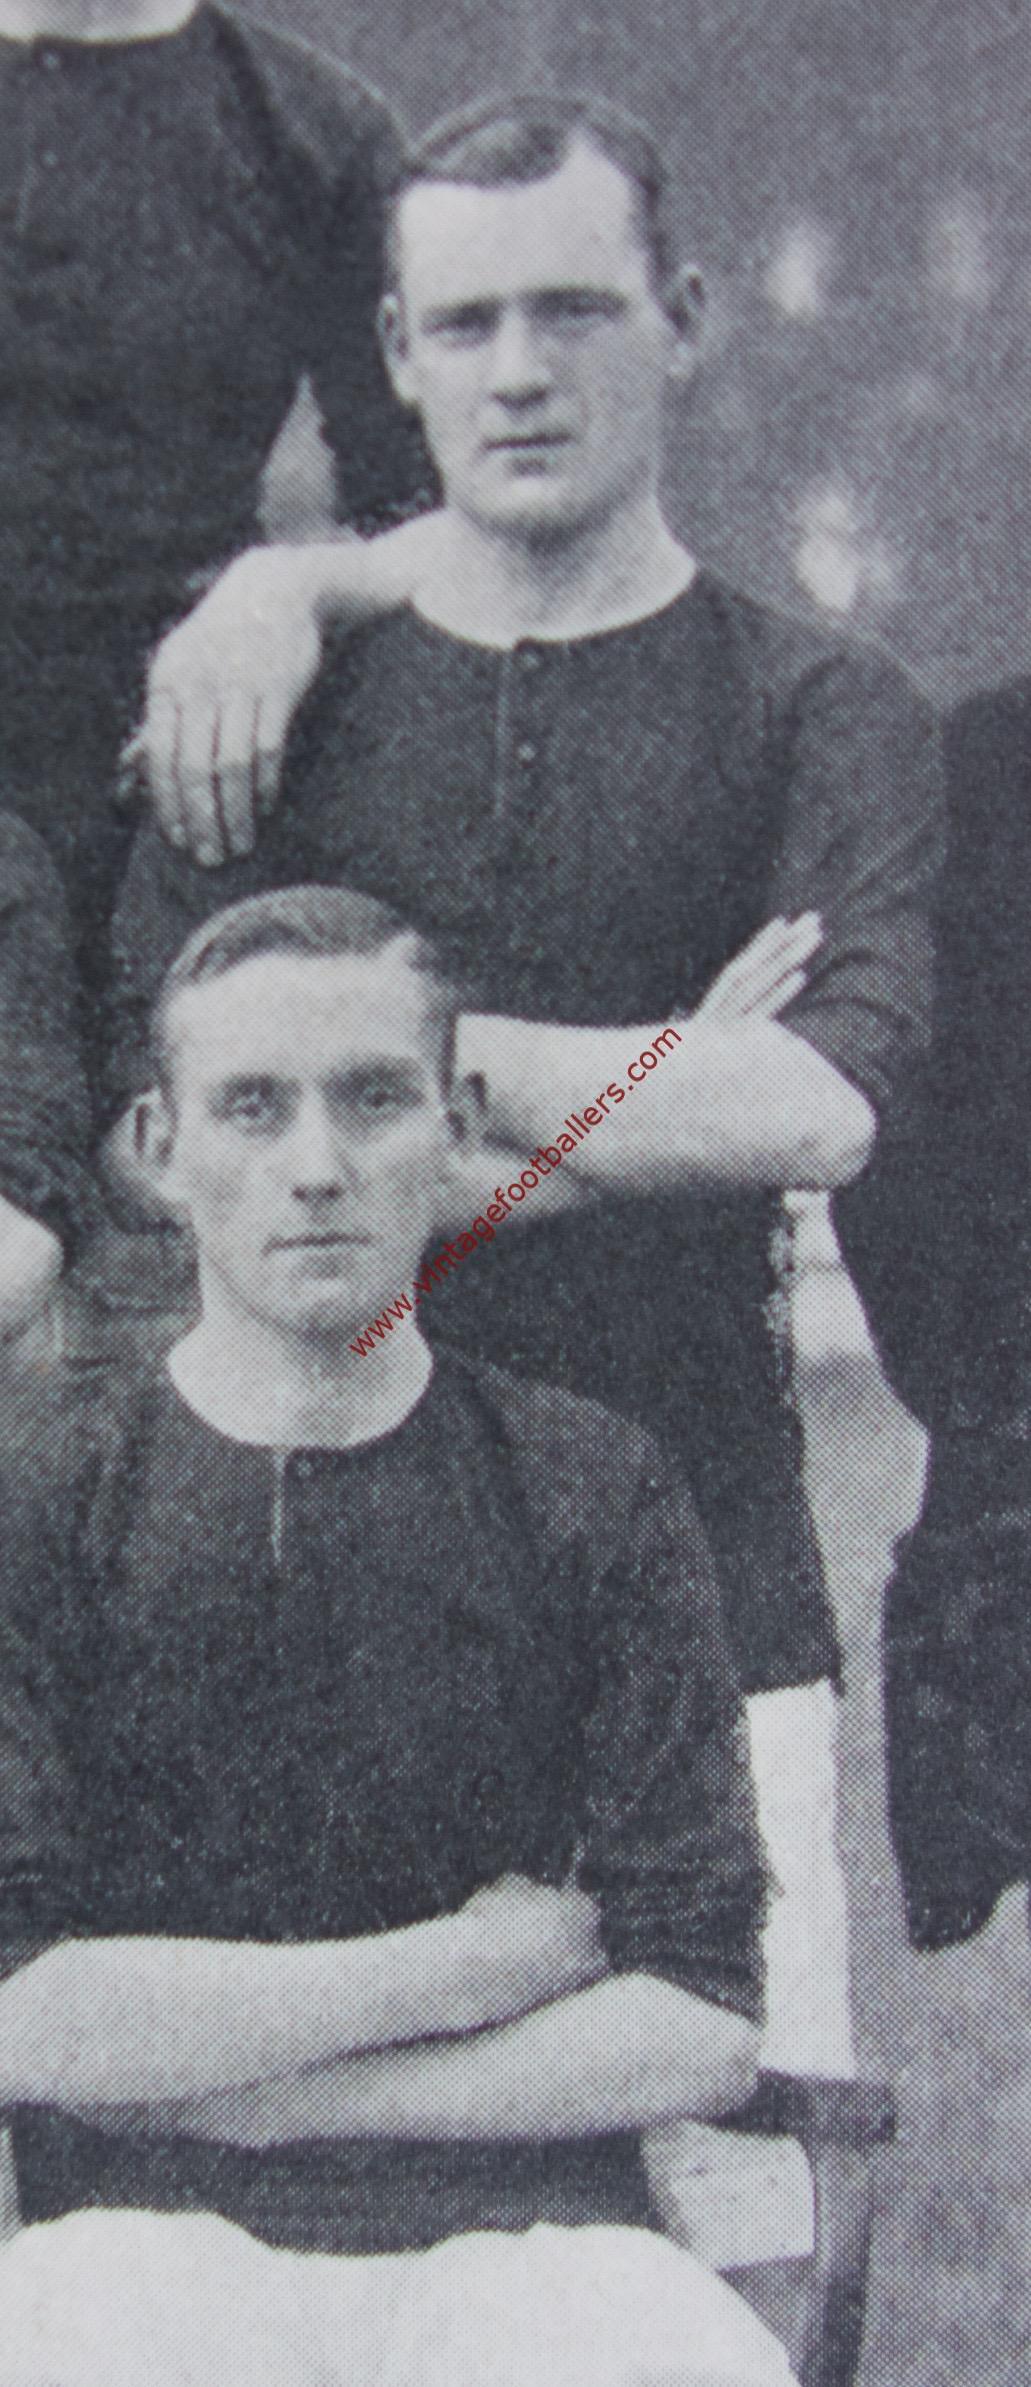 7f177e26821 Peddie Jock Image 3 Manchester United 1905 - Vintage Footballers